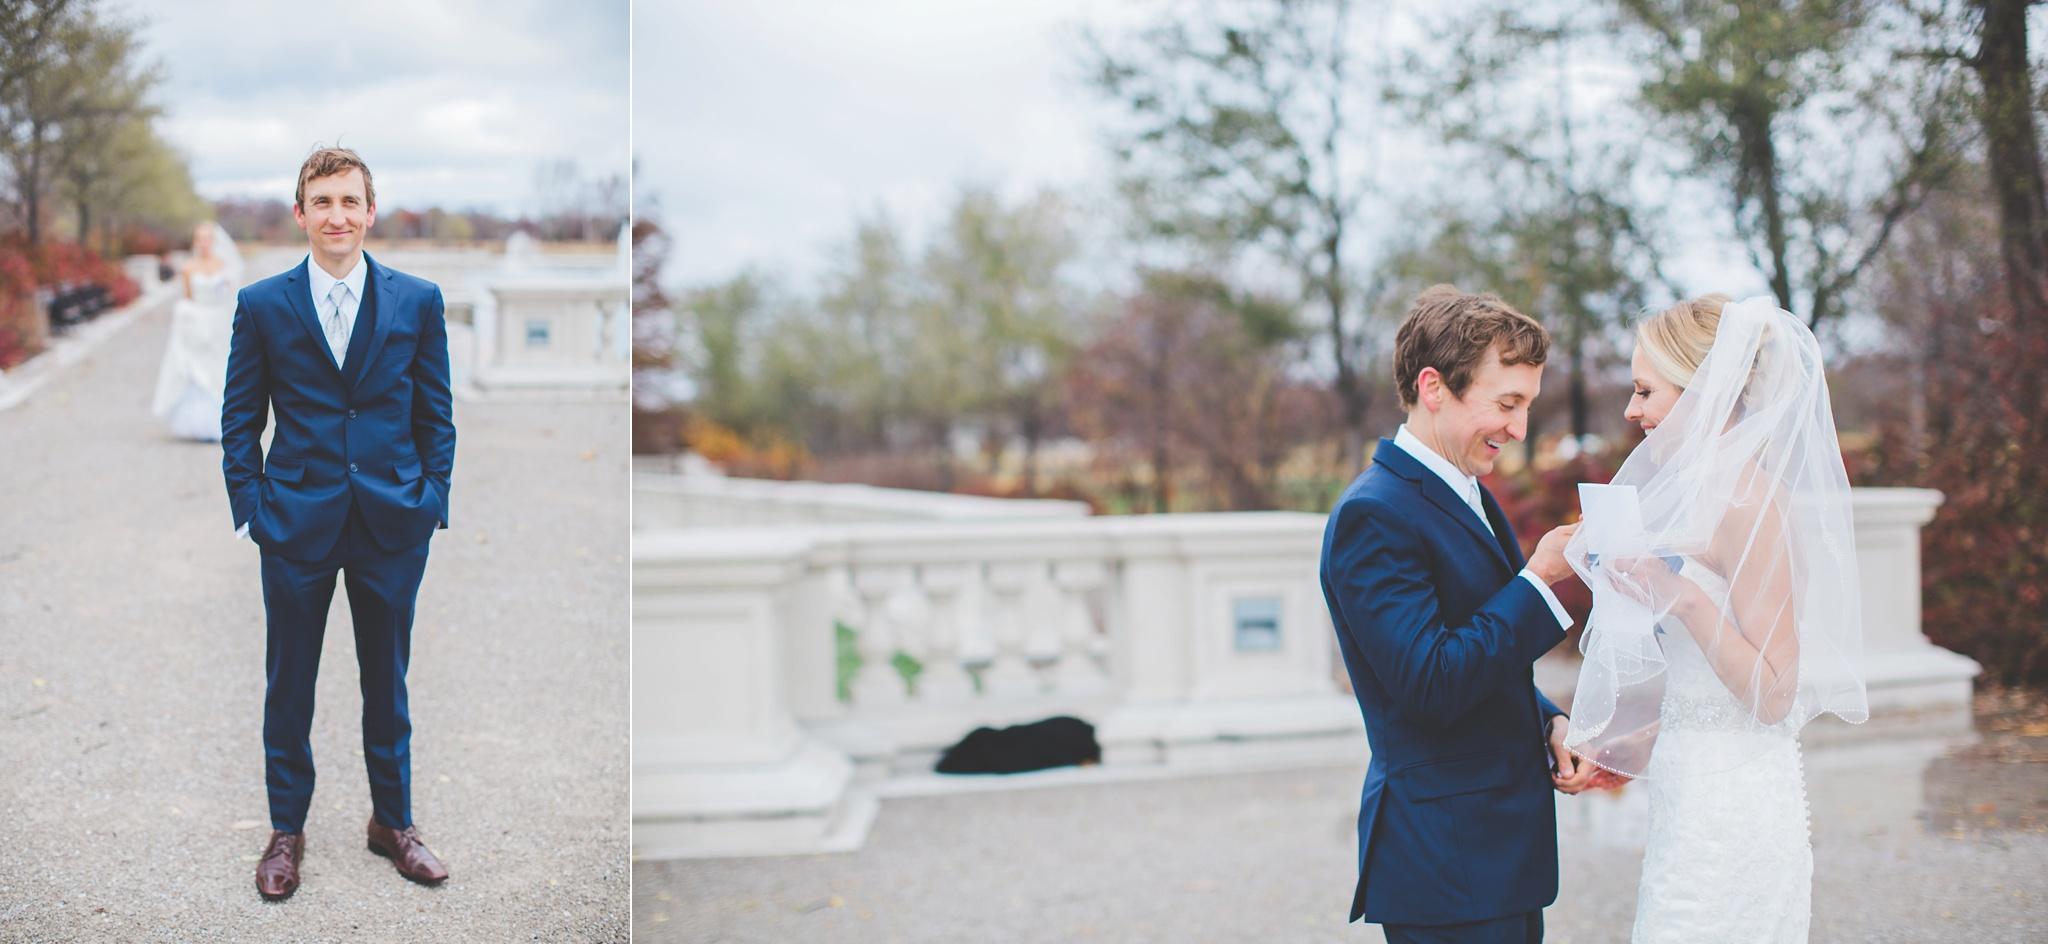 St. Louis Wedding Photographer   Chandler Rose Photography_0018.jpg